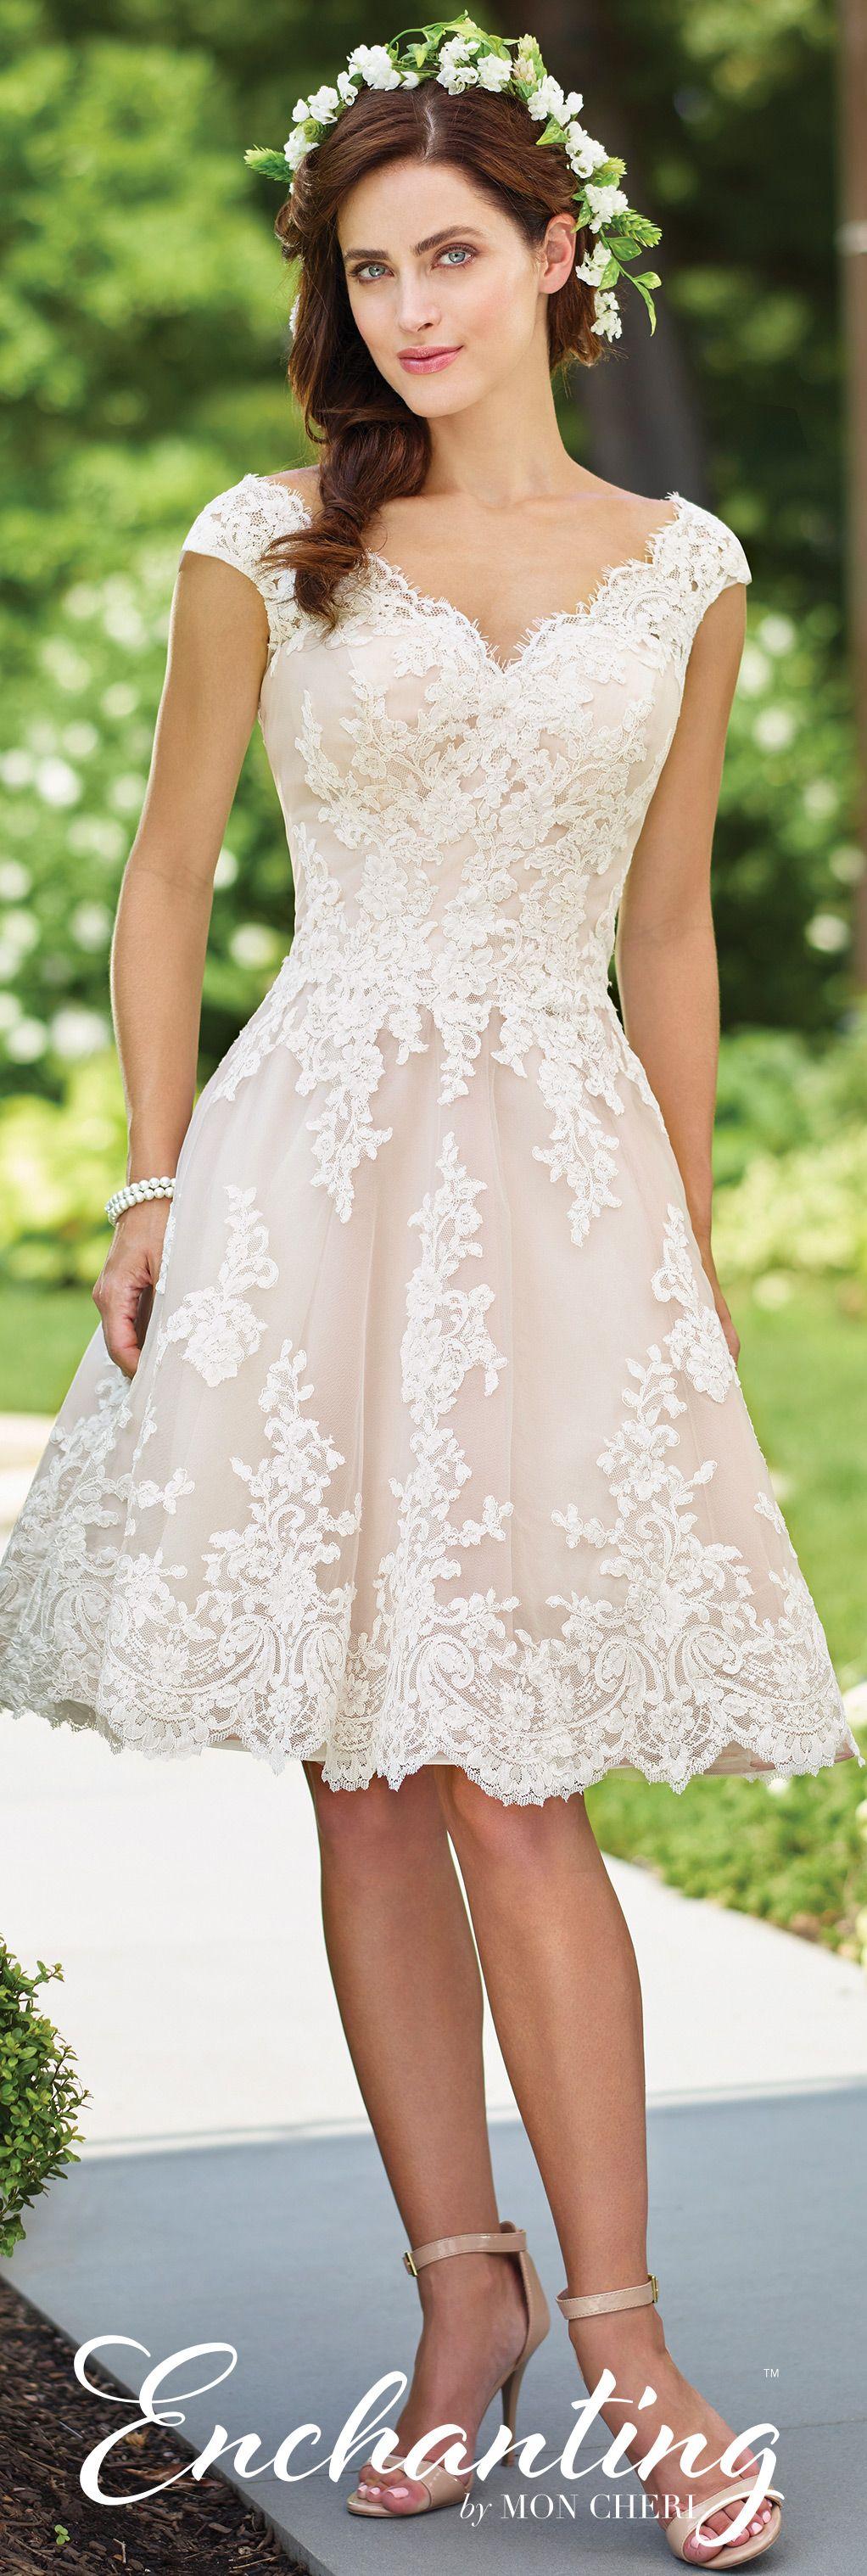 Modern Wedding Dresses 2019 by Mon Cheri Best wedding